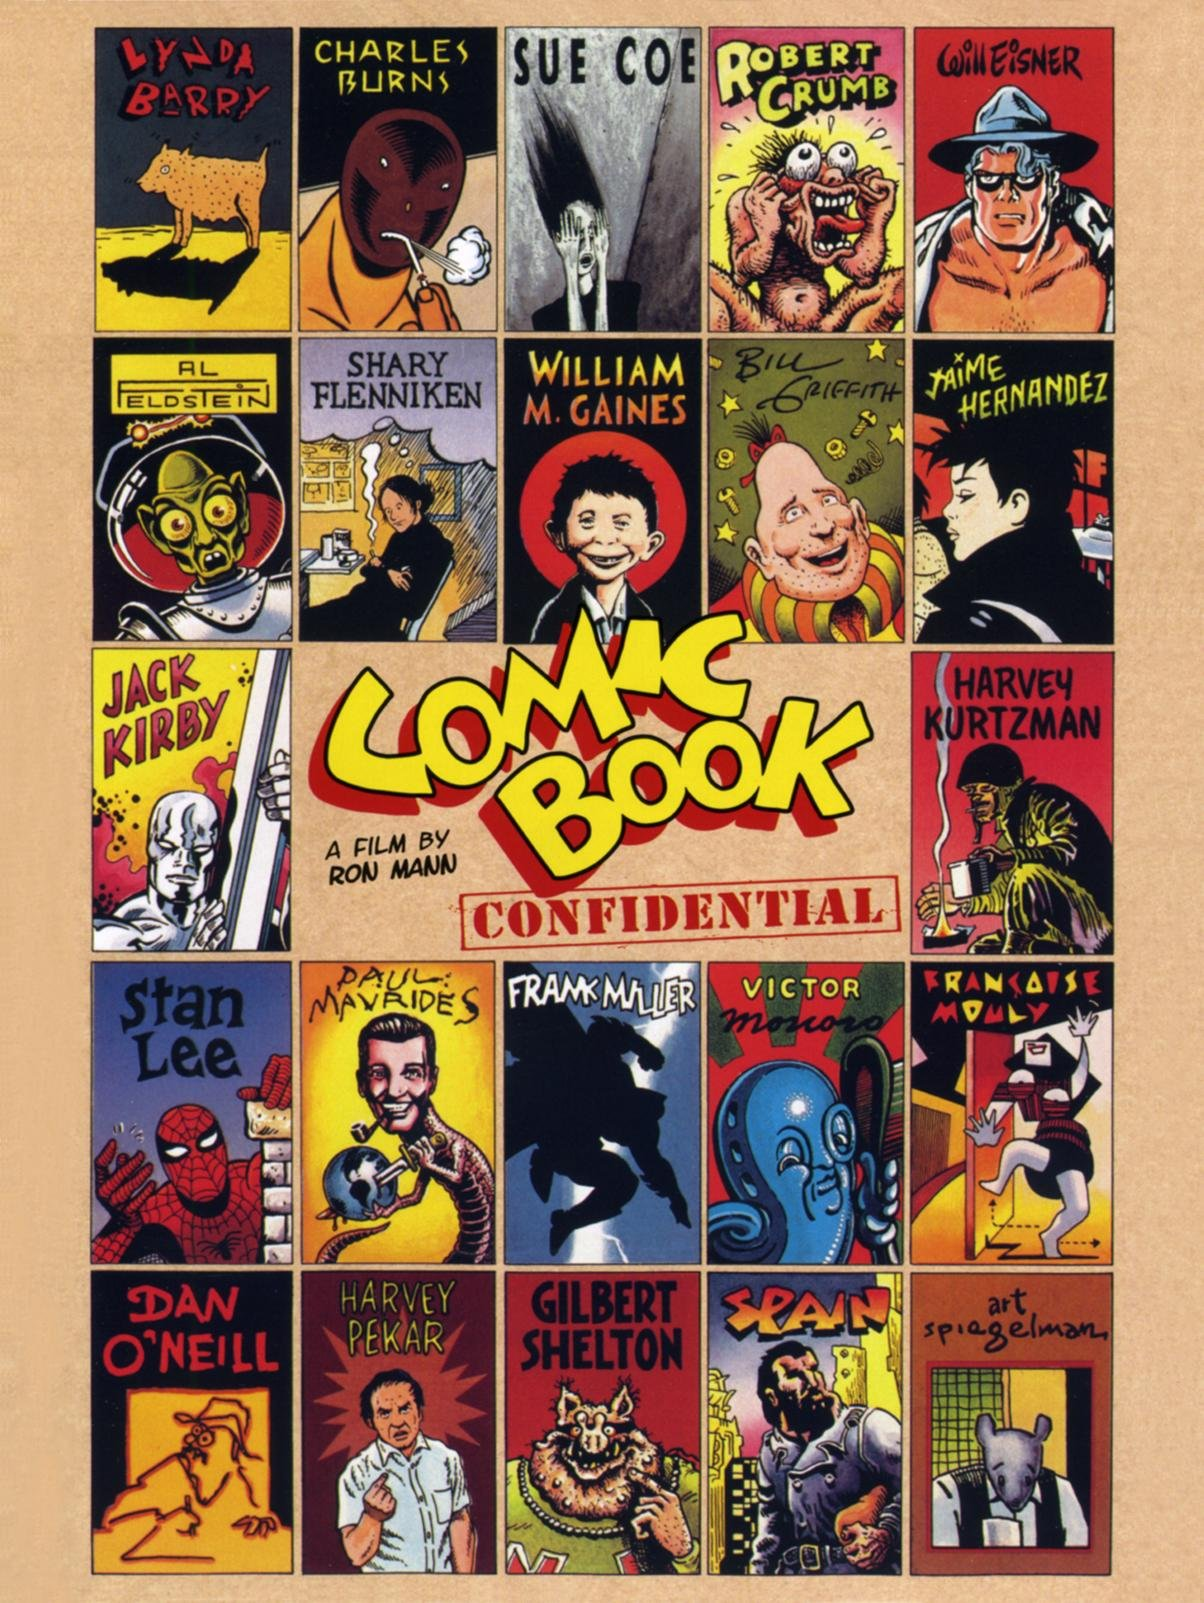 ic book confidential lynda barry robert crumb